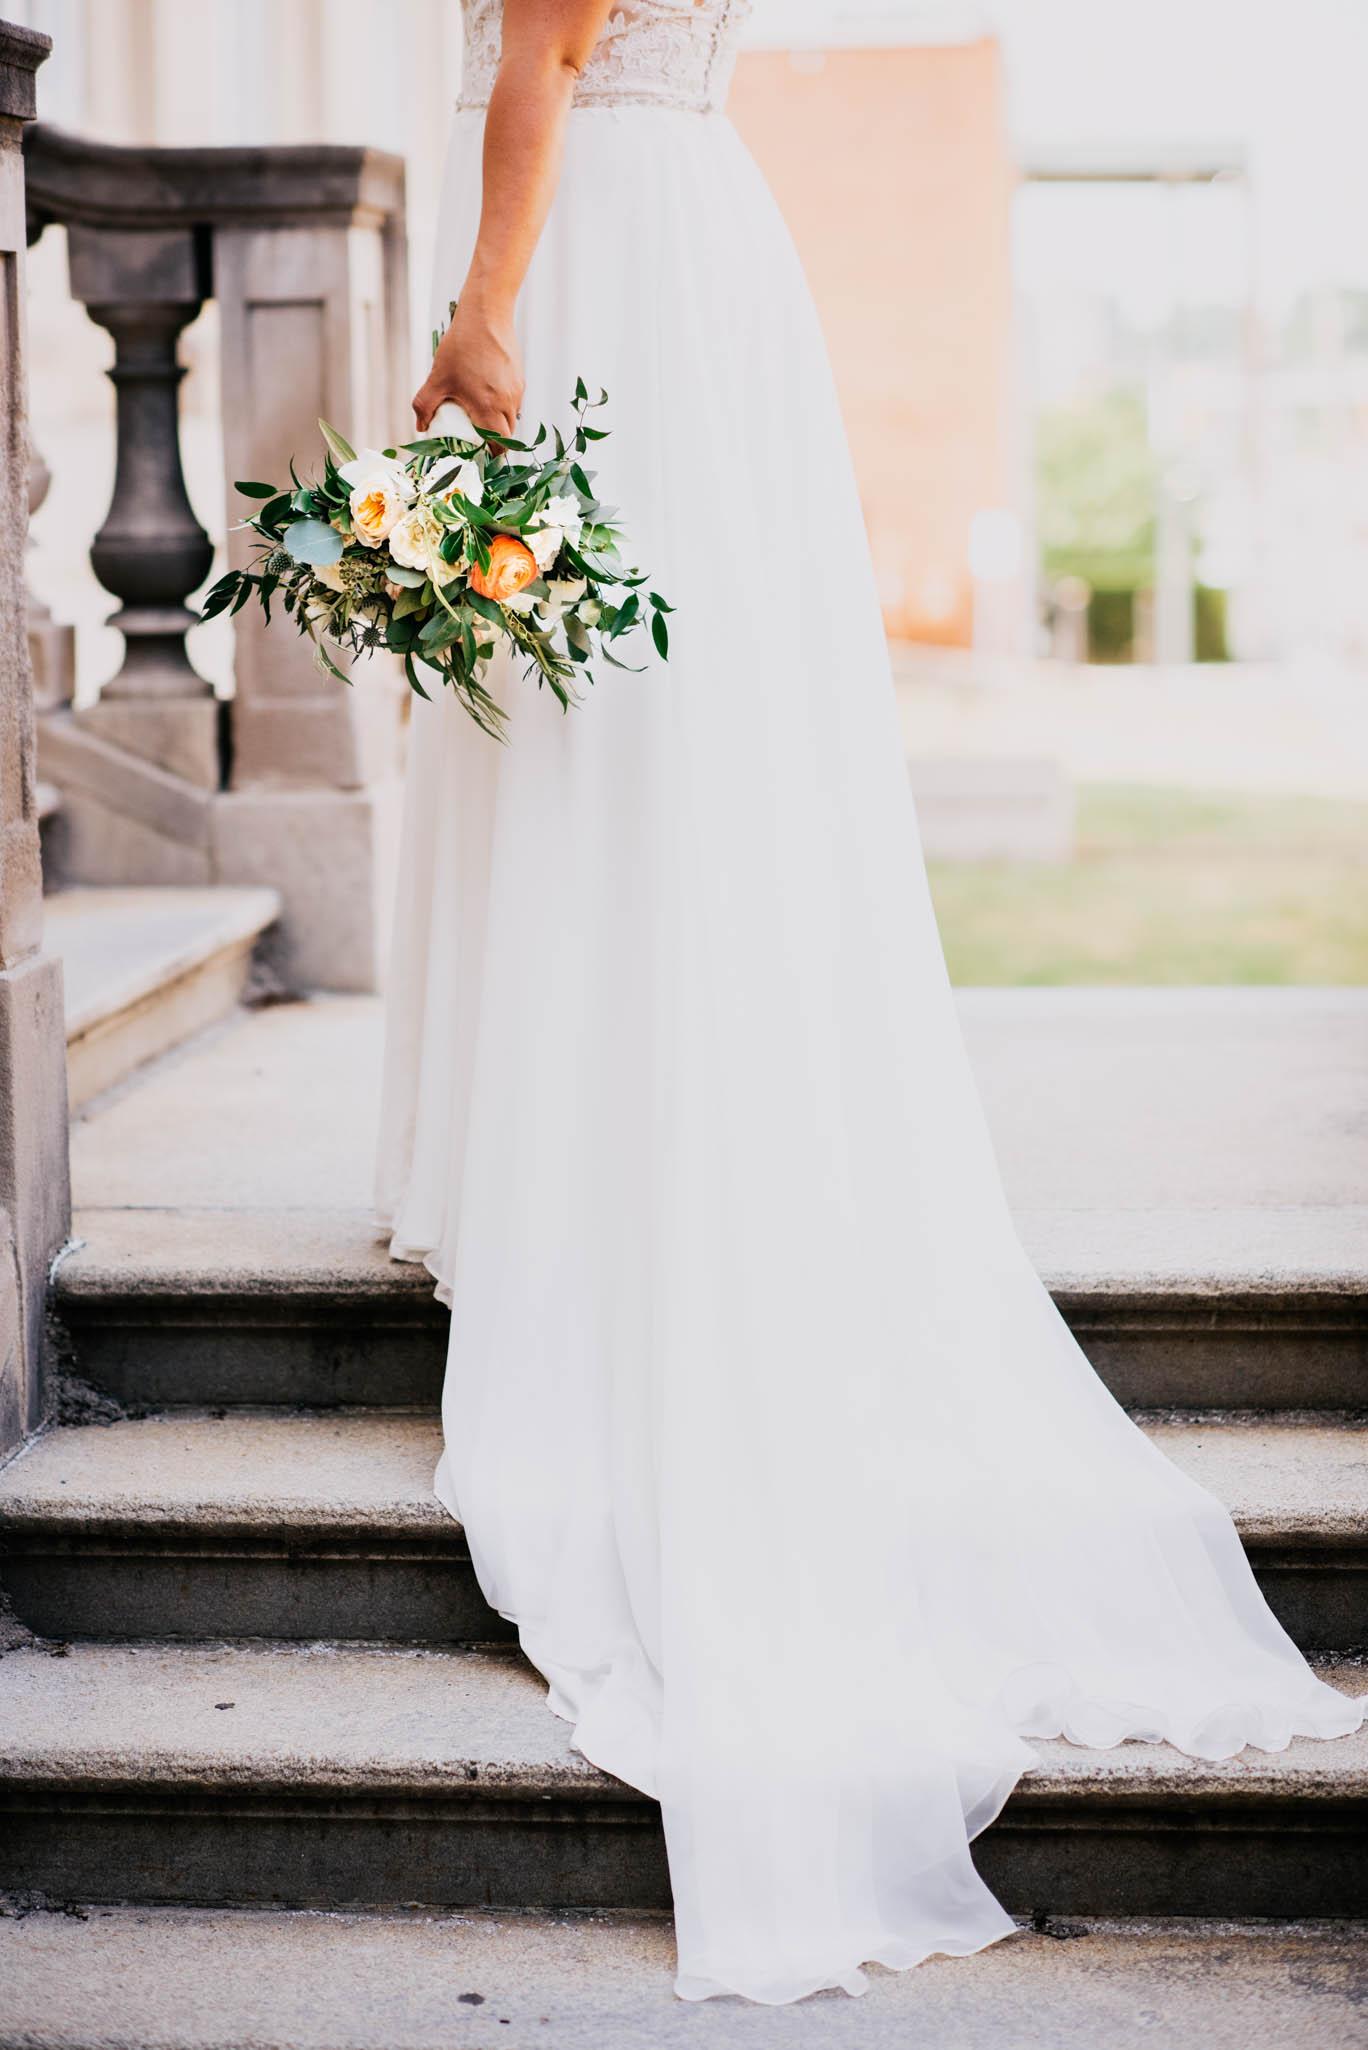 rickhouse-weddings-durham-adam-chapin-photography-1.jpg